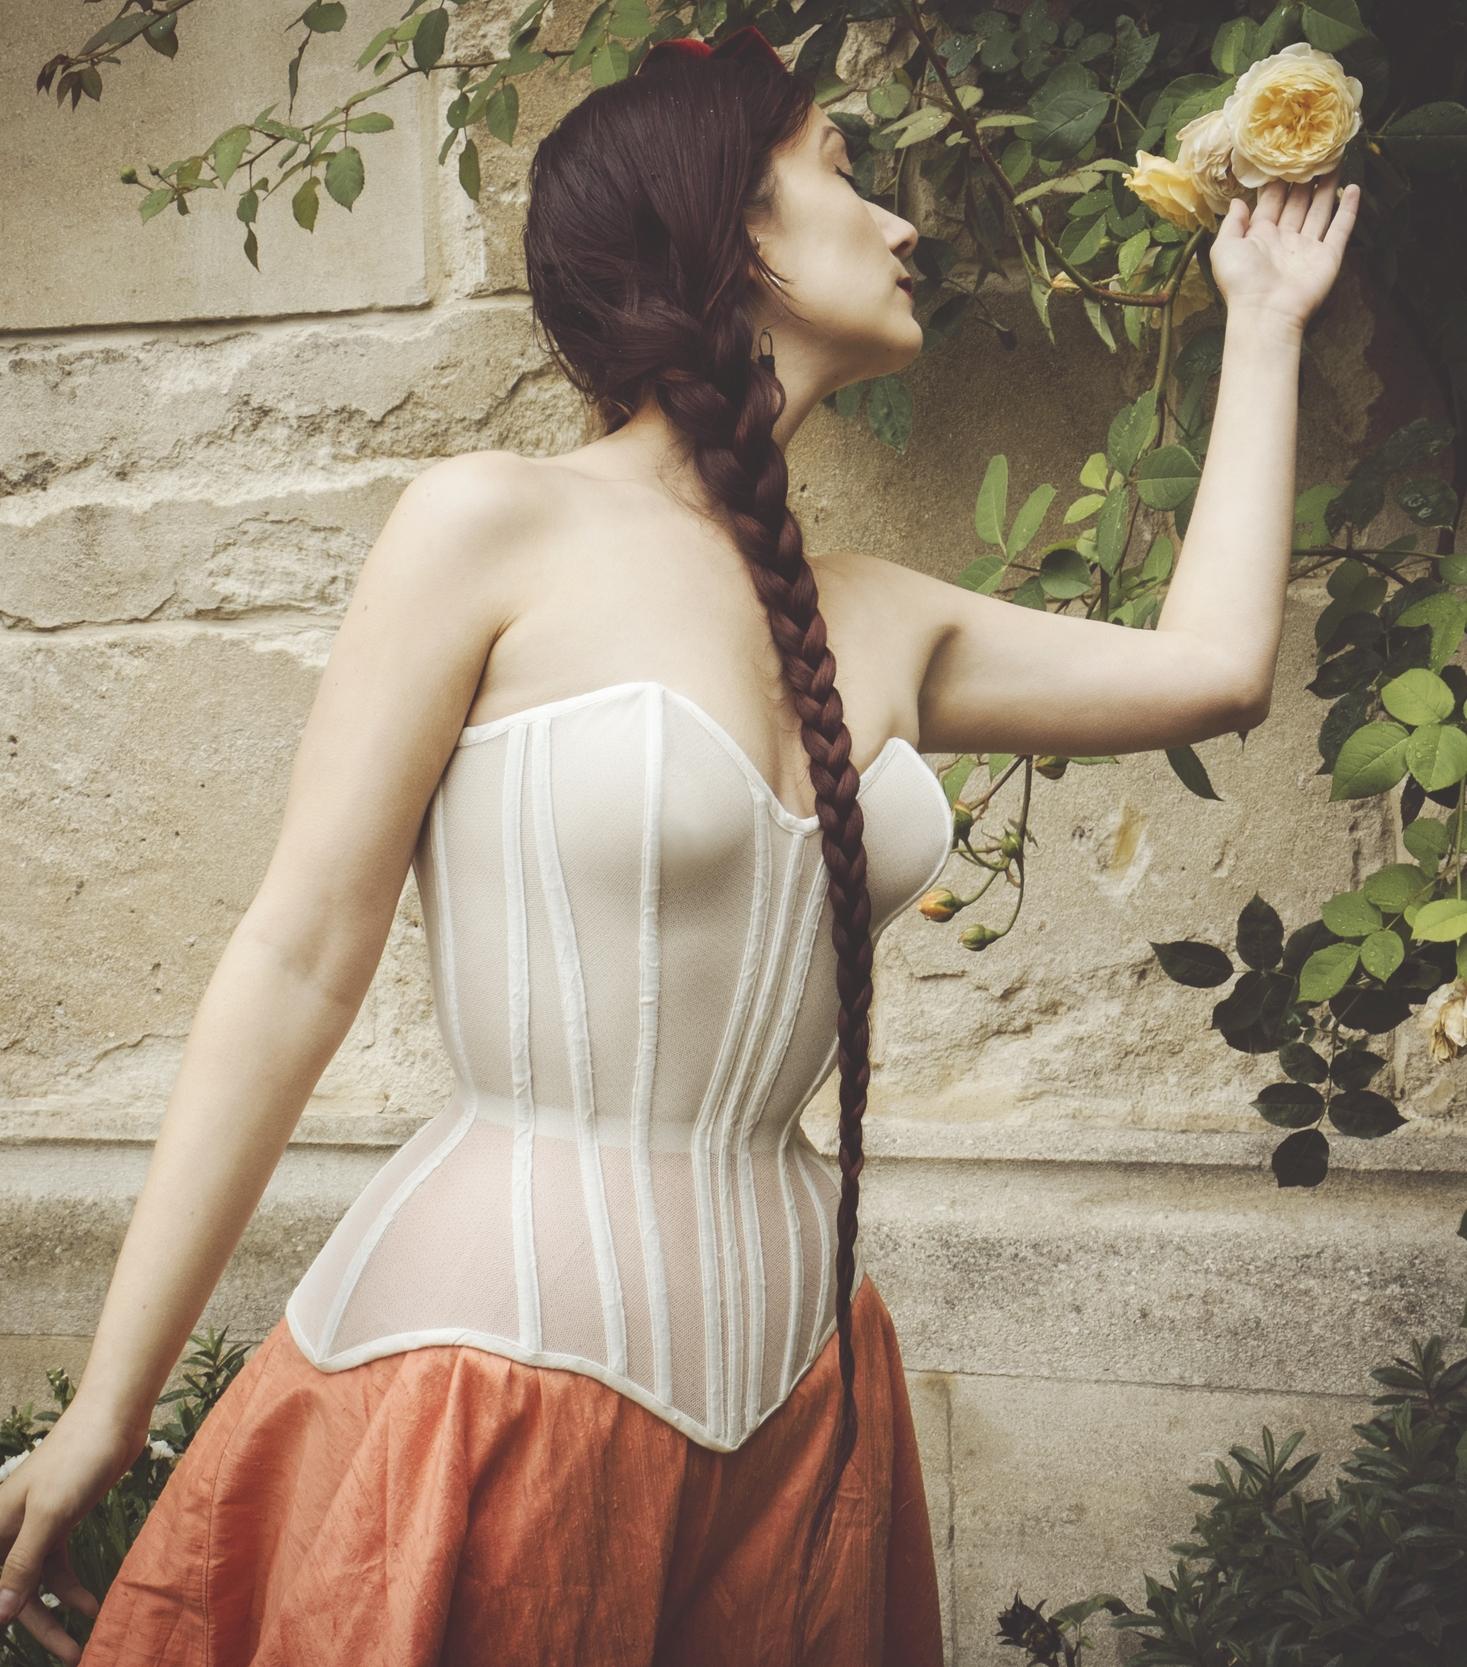 corset by moruadesigns modelled by victoria dagger copyright jenni hampshire 2014